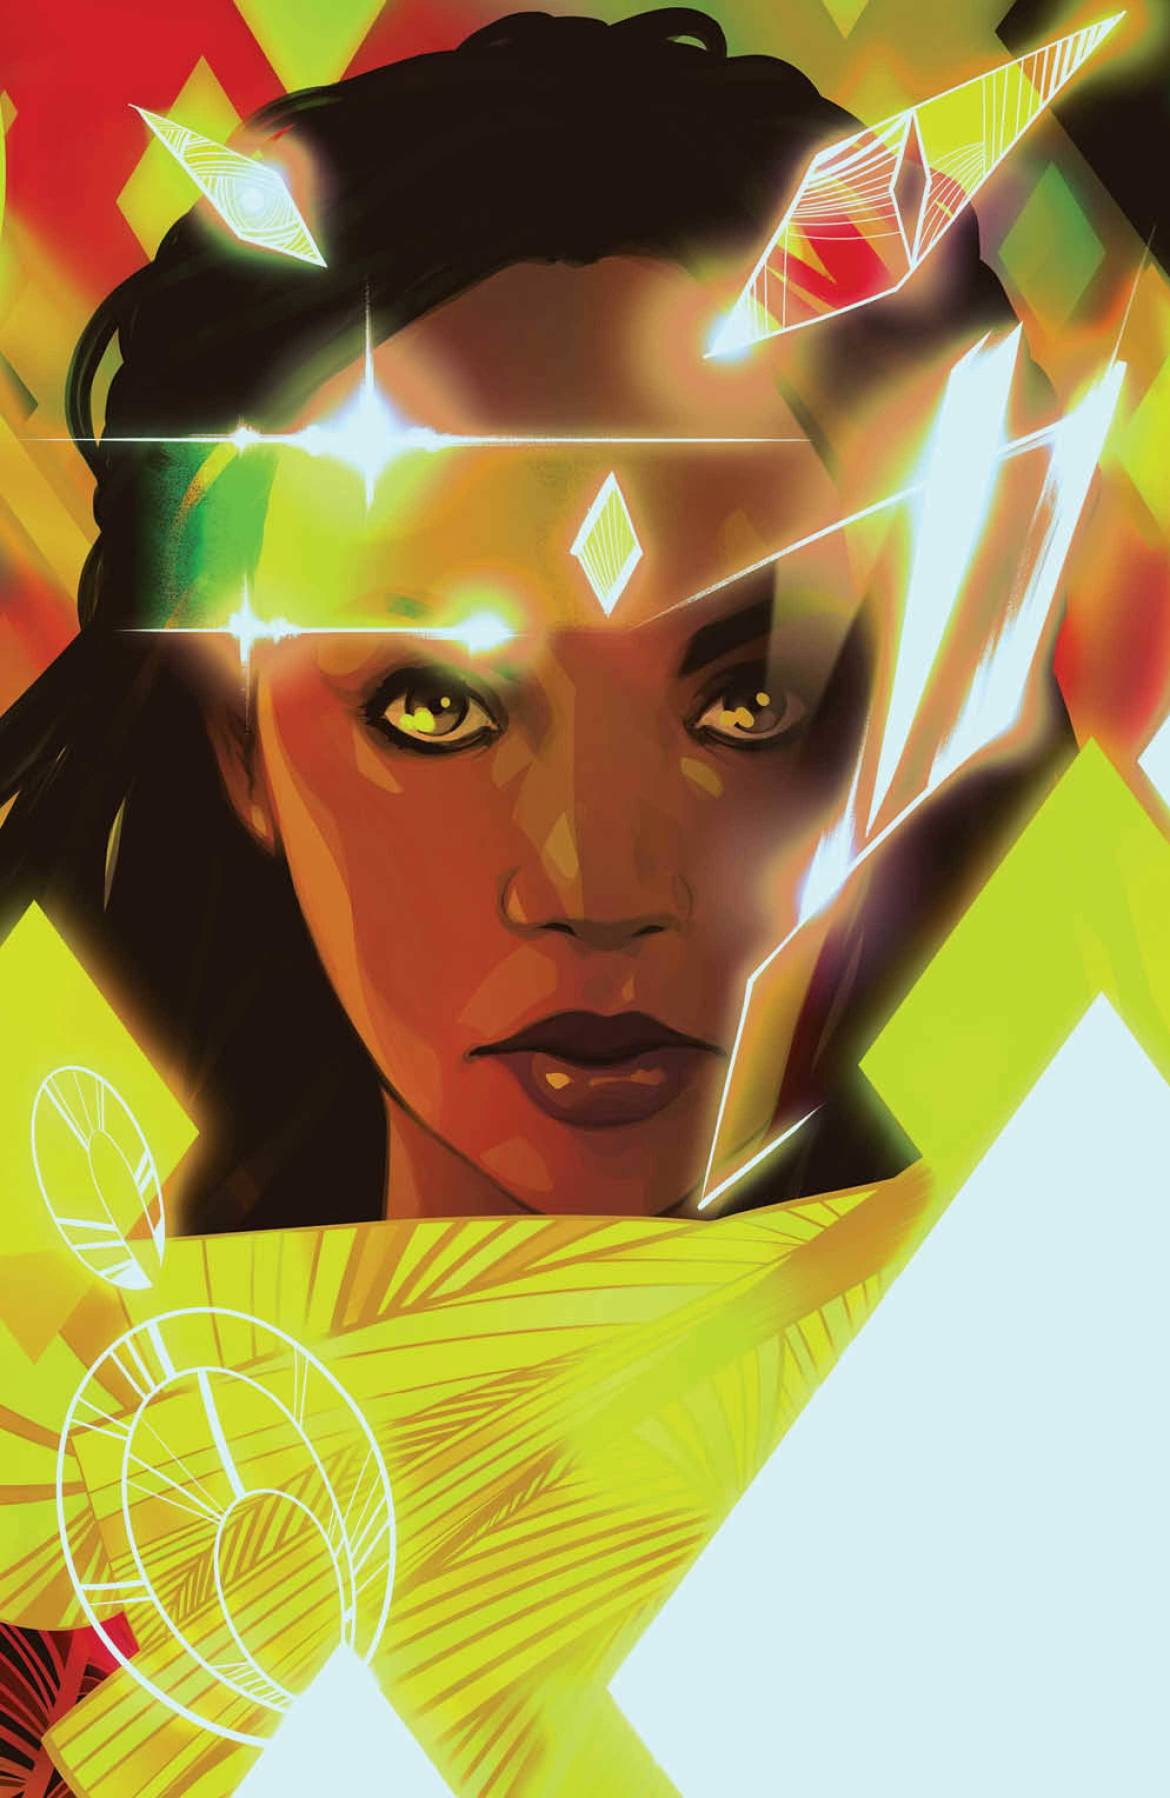 STL173457 ComicList: BOOM! Studios New Releases for 01/13/2021